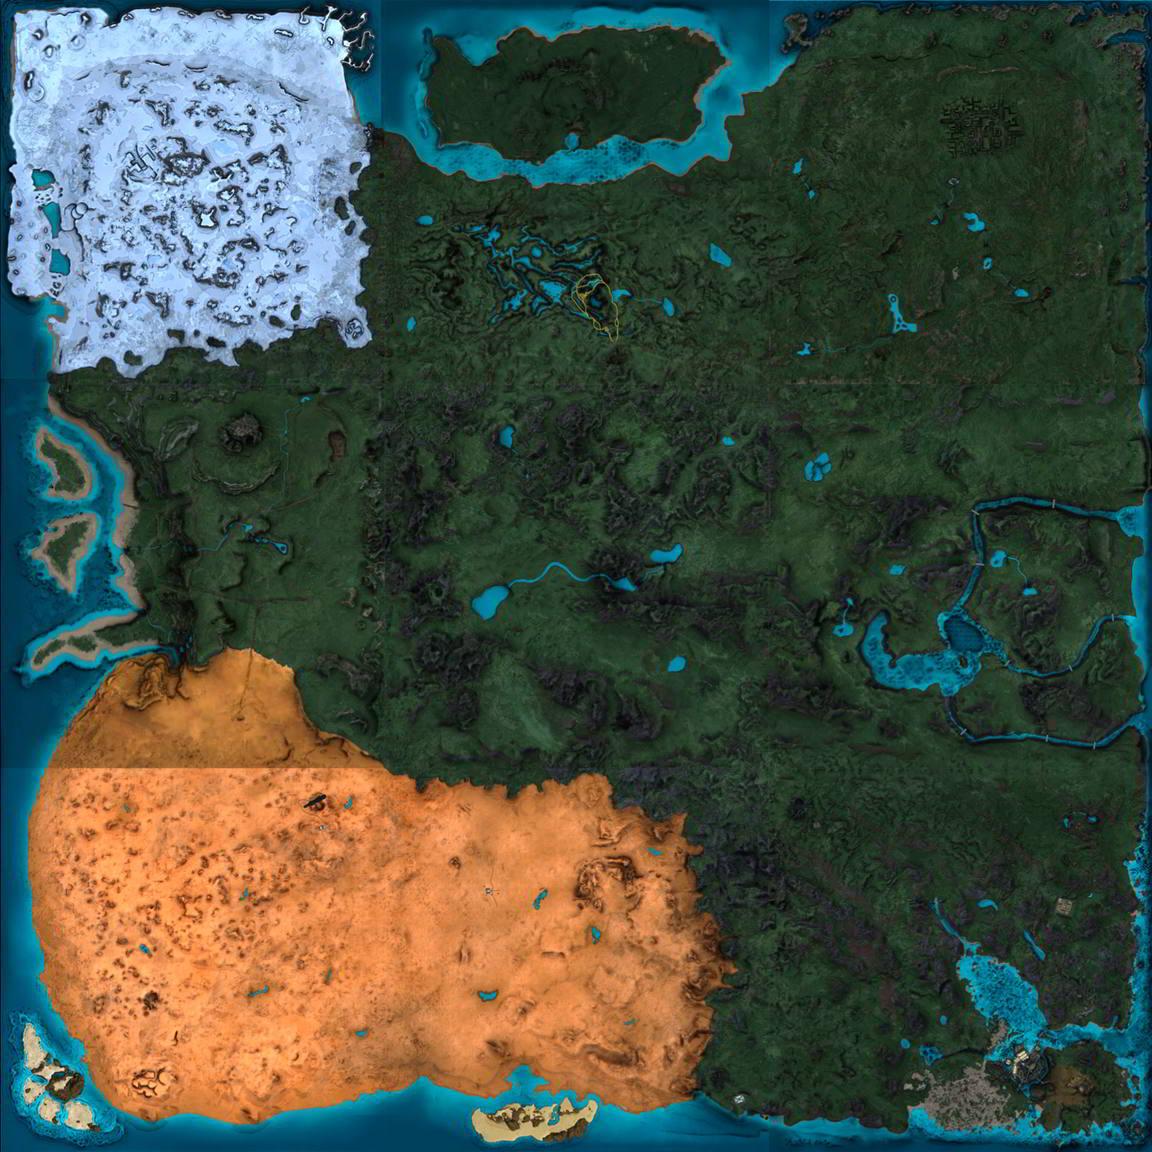 Arkadia map empty 1152x1152.jpg